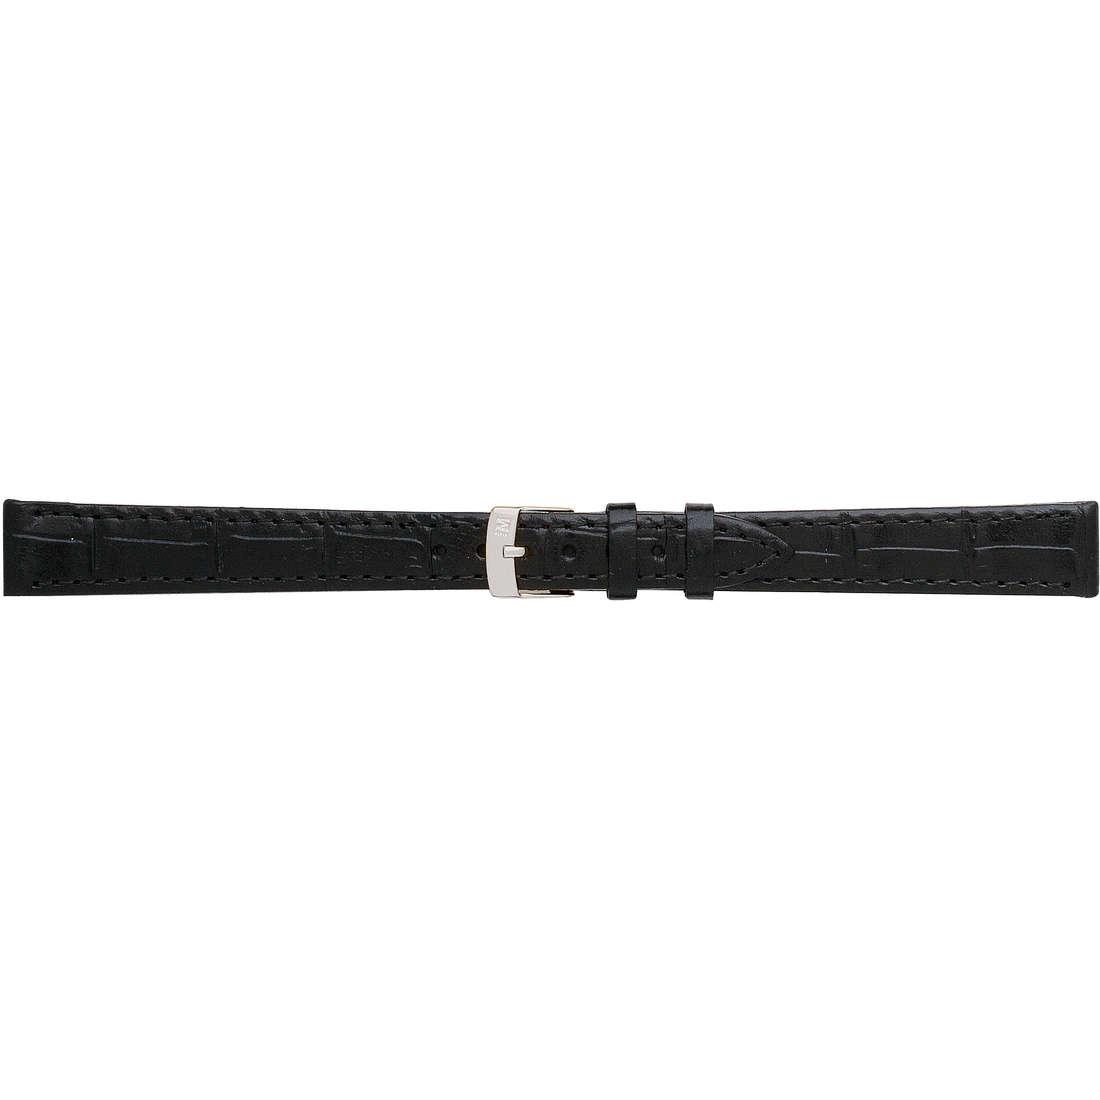 montre bande de montres unisex Morellato I Lunghi A01Y2524656019CR20